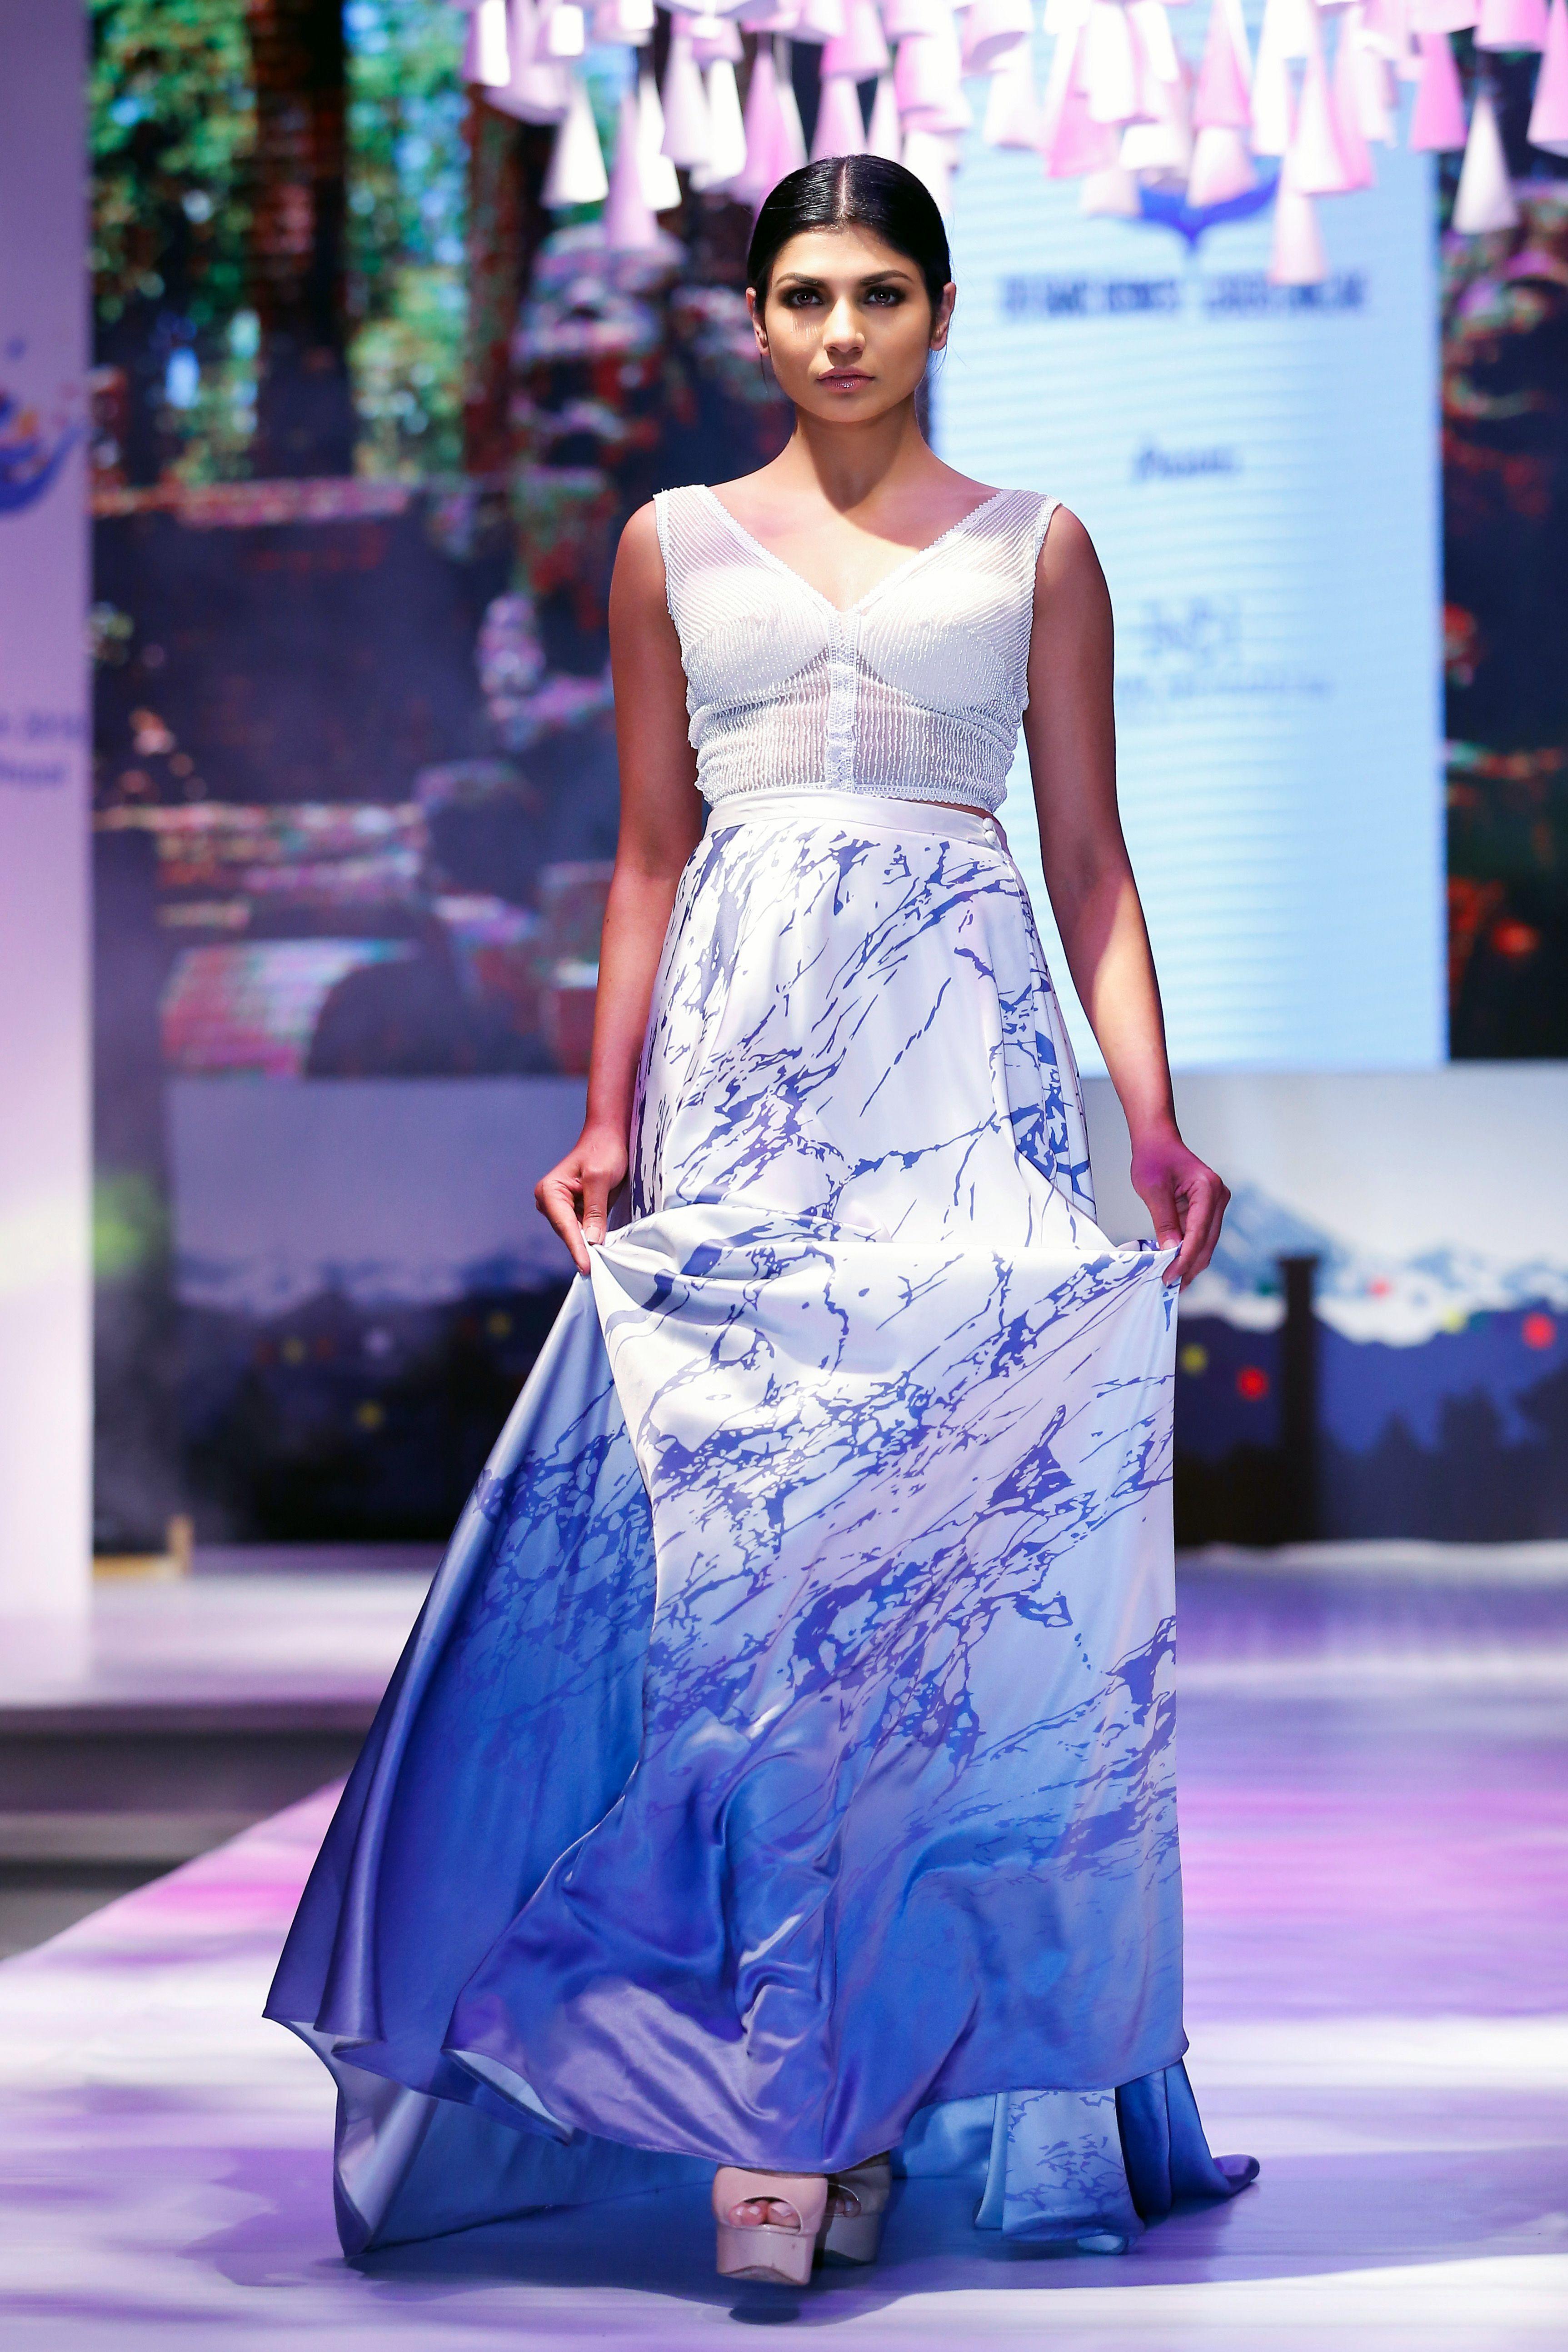 Indi Demi Couture Fashion Designer Srilanka Bride Sri Lankan Bride Kandyan Saree Saree Drape Saree Dress Madeup Saree Sri La Dresses Couture How To Wear